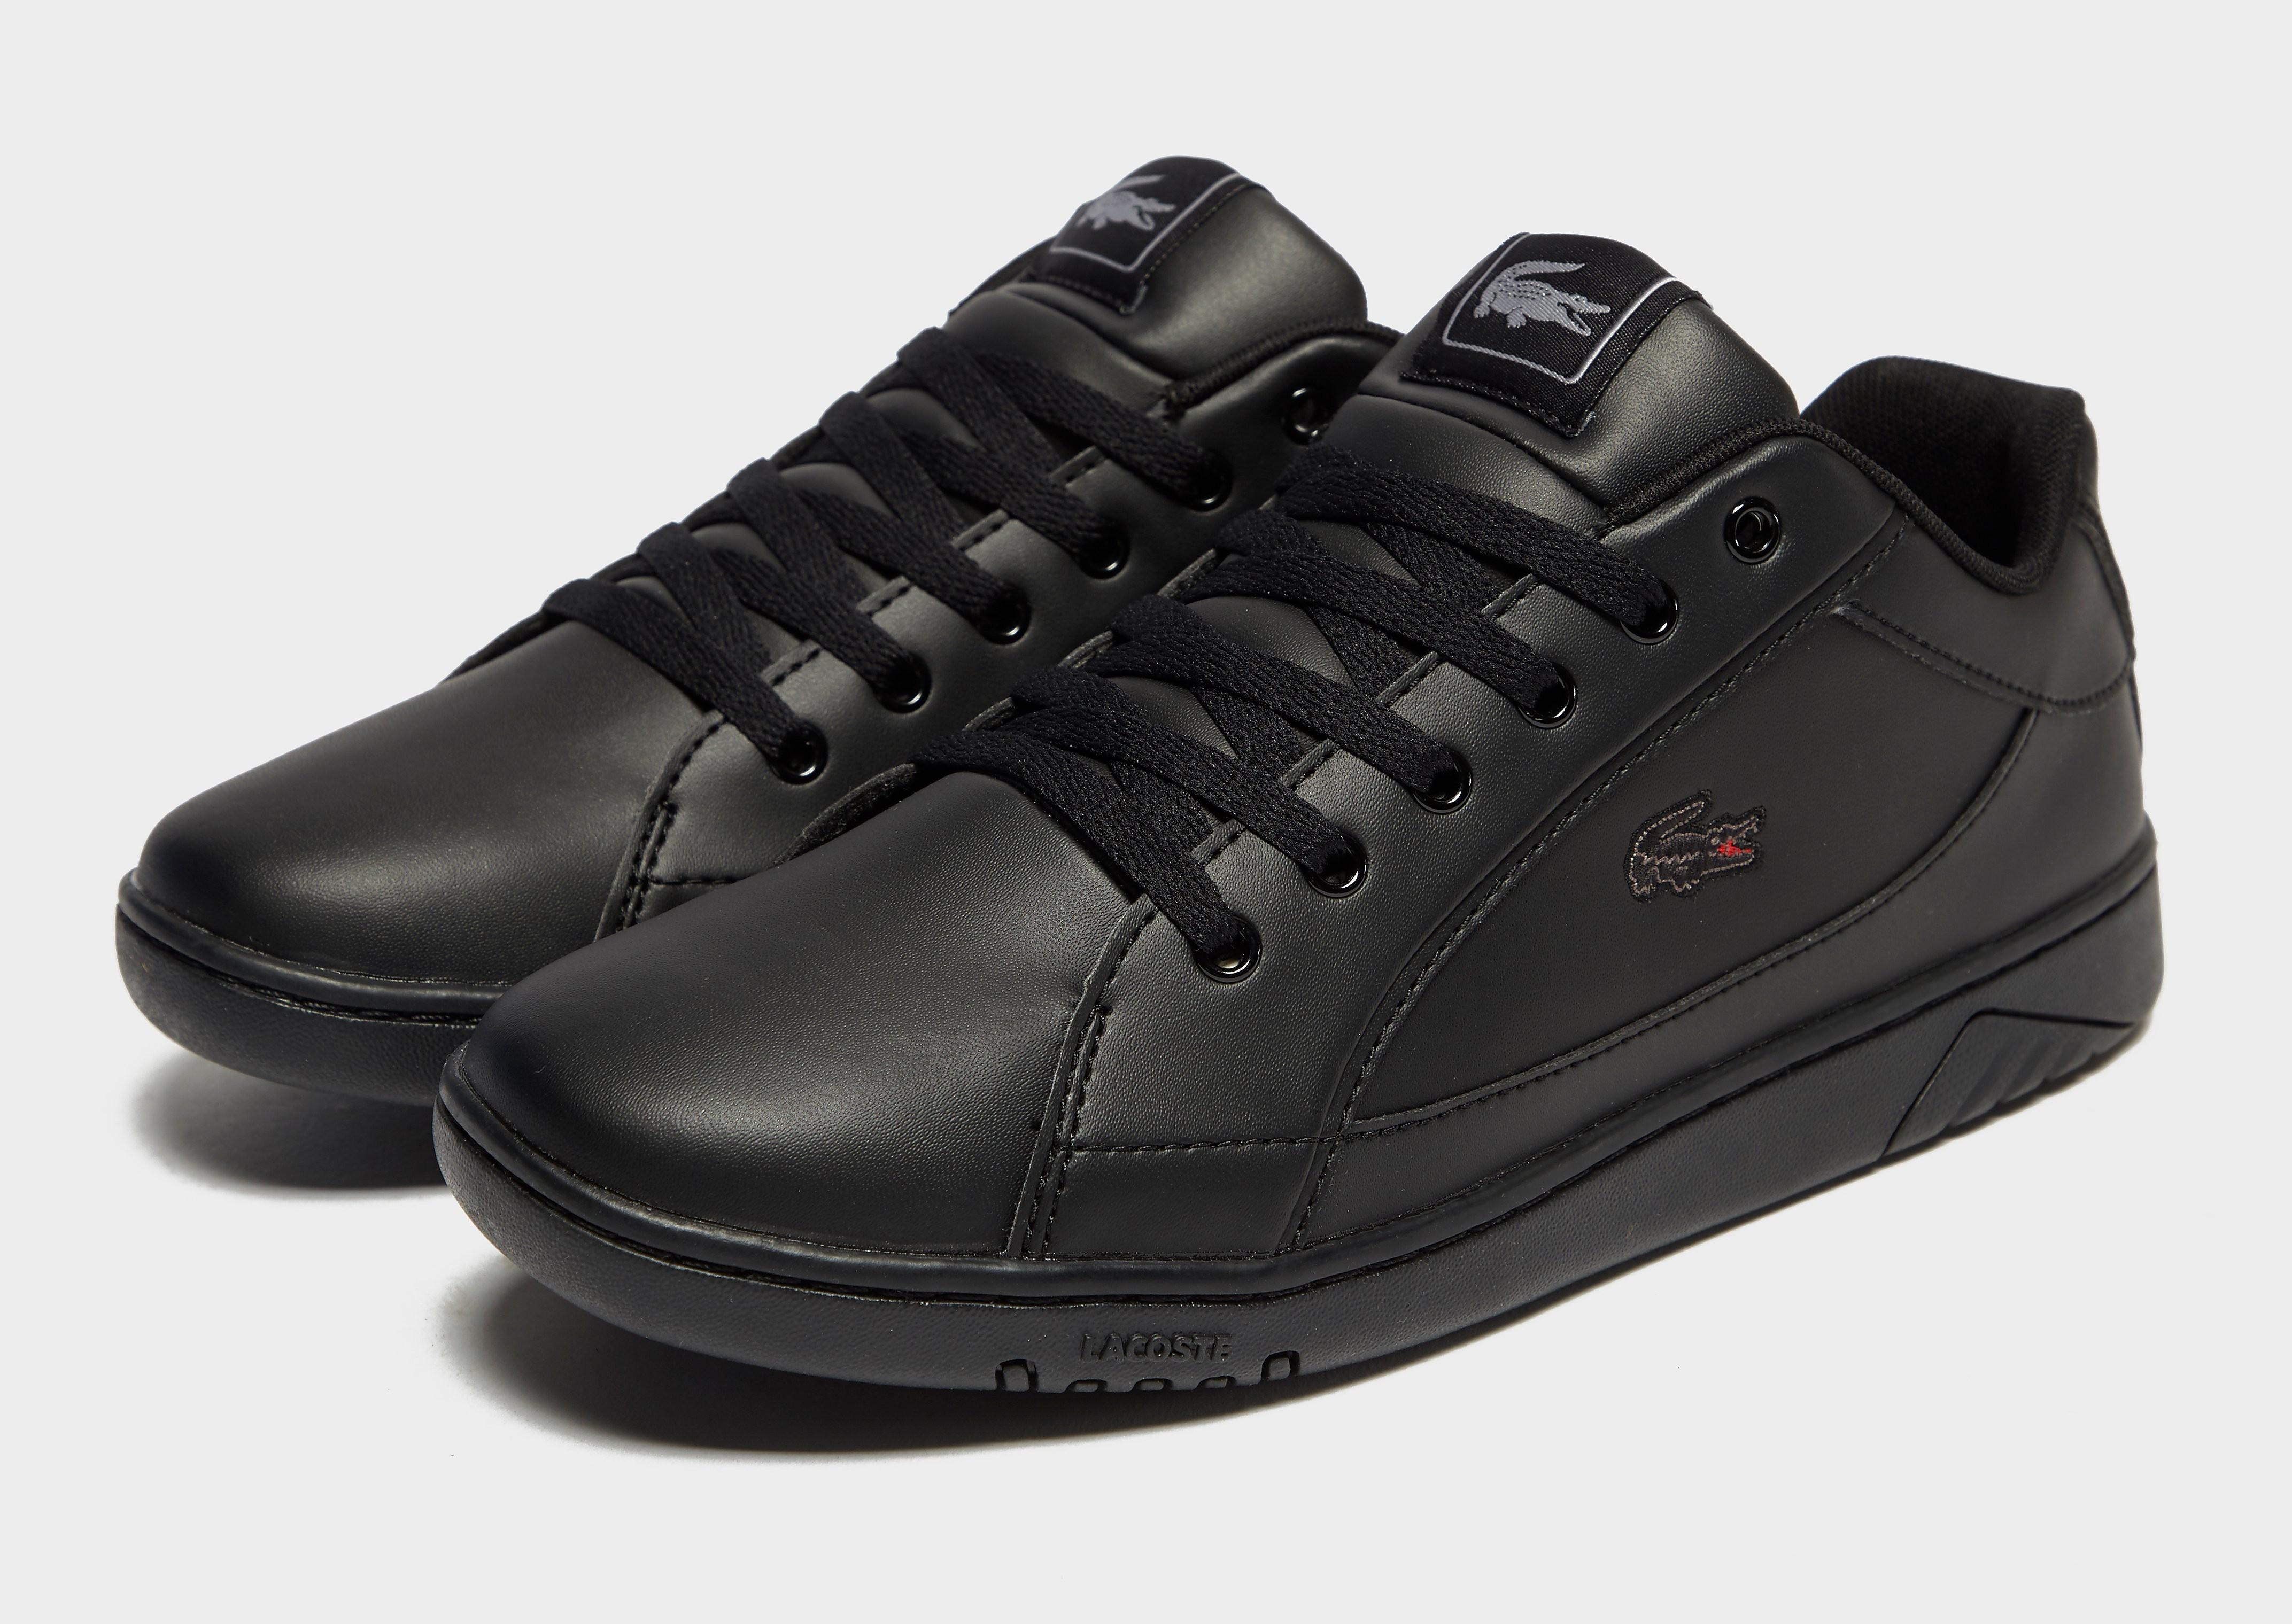 Lacoste Deviation Leather